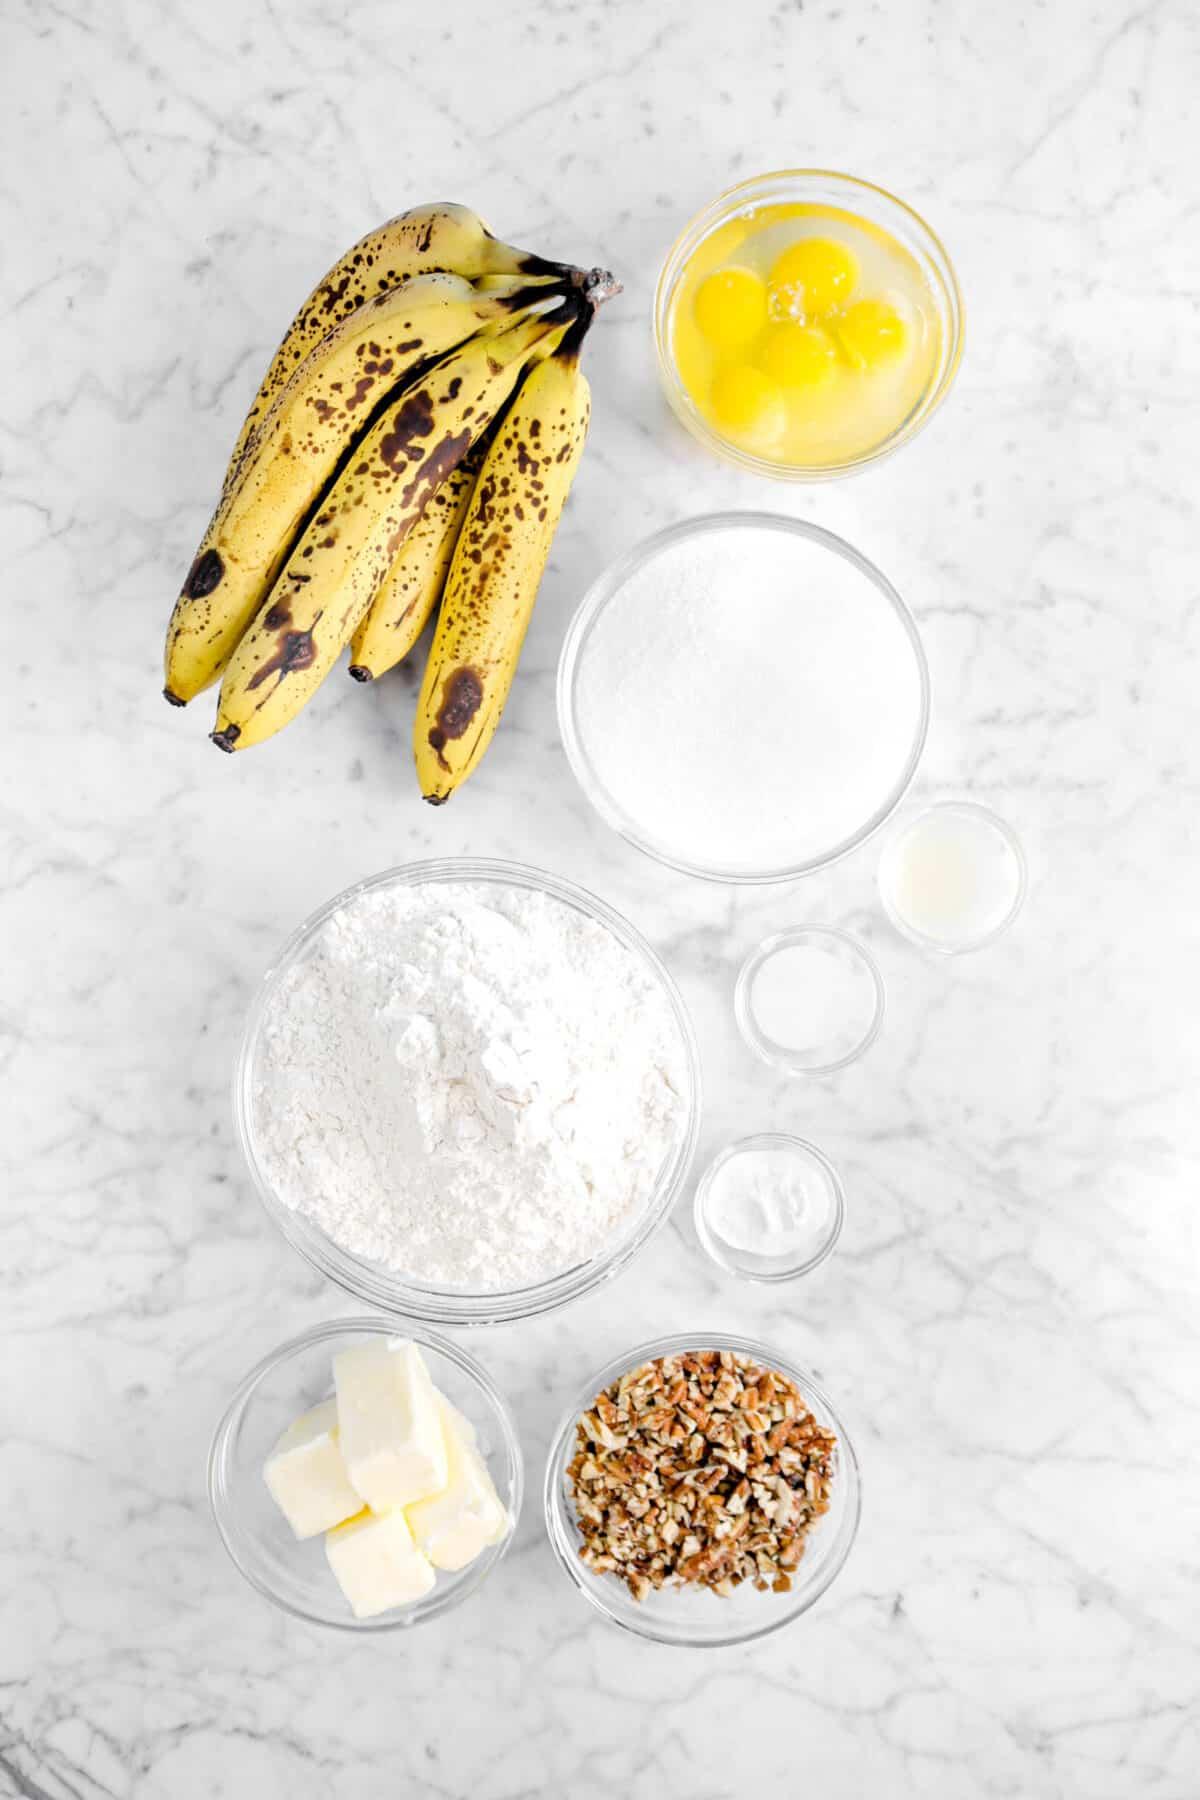 bananas, eggs, sugar, lemon juice, baking soda, salt, flour, chopped pecans, and butter on marble counter